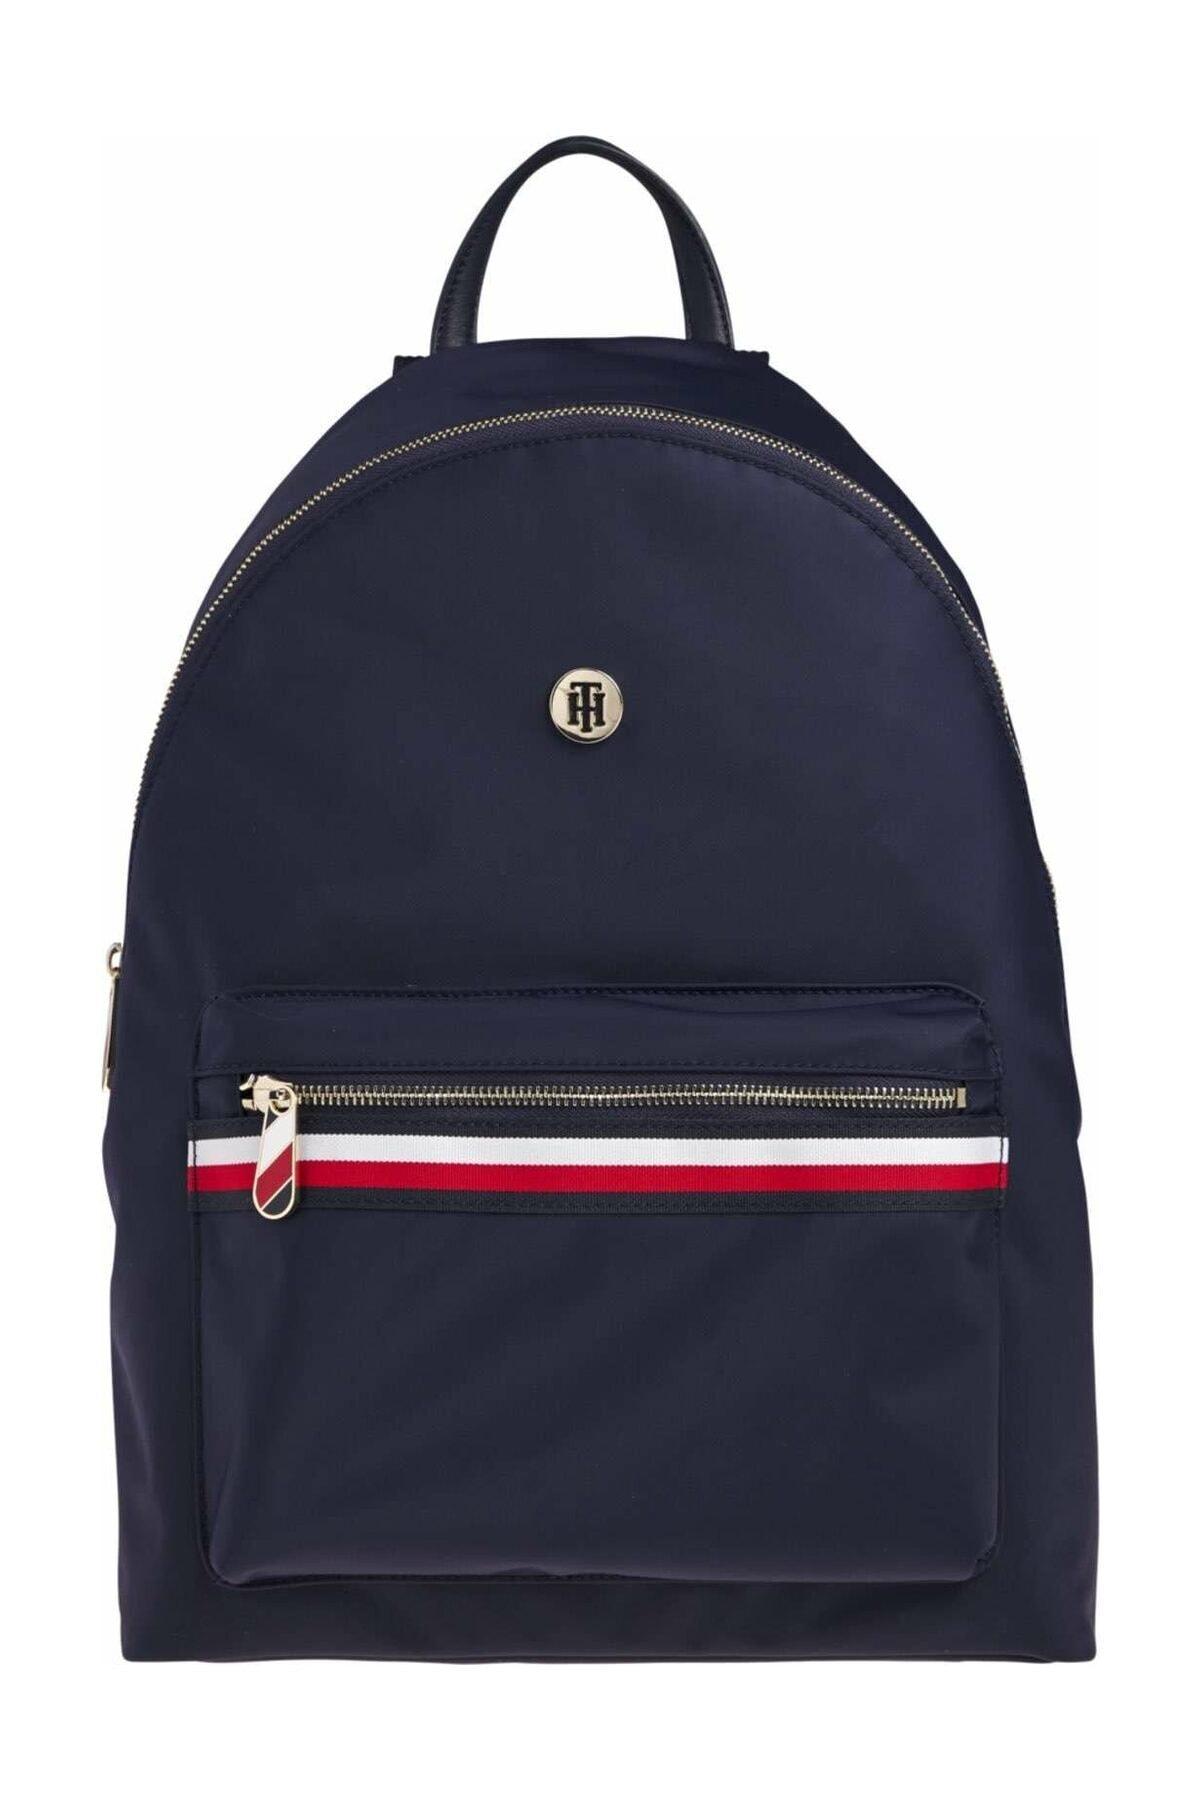 Tommy Hilfiger Kadın Mavi Sırt Çantası Poppy Backpack Corp AW0AW08823 1